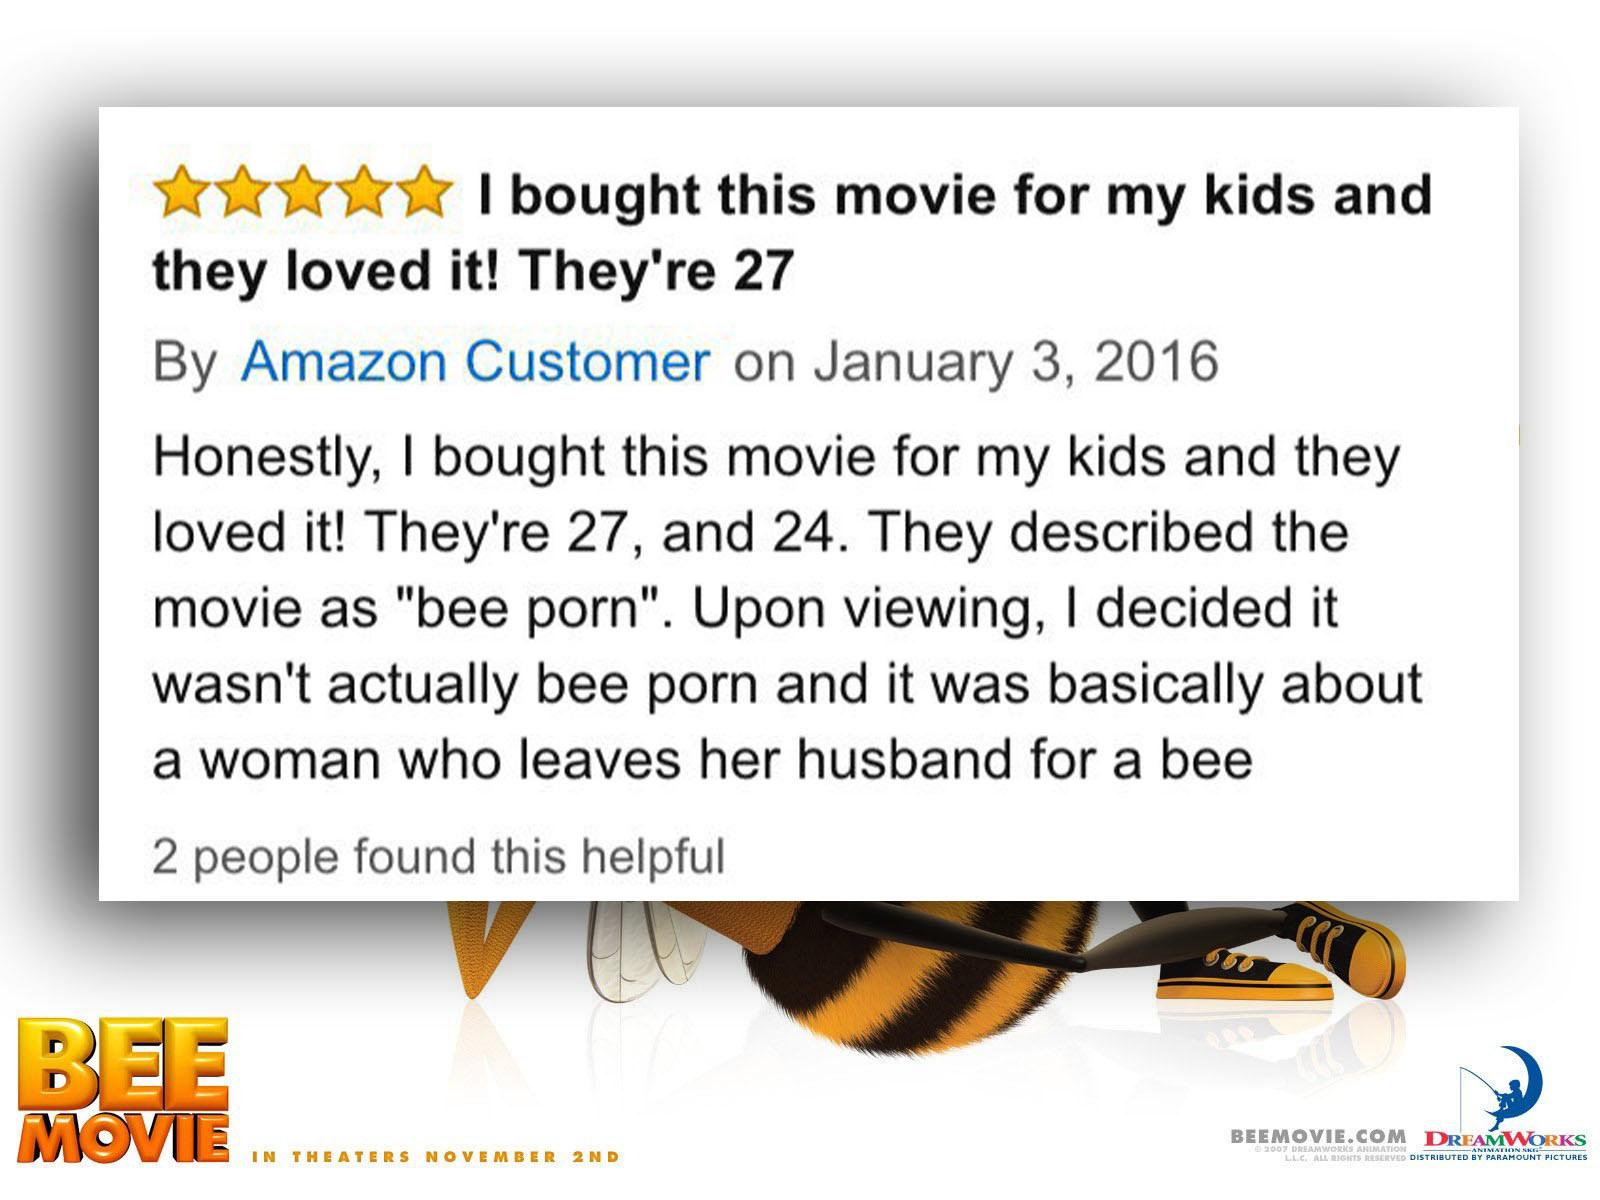 11 Lukewarm Five Star Amazon Reviews That Will Make You Laugh